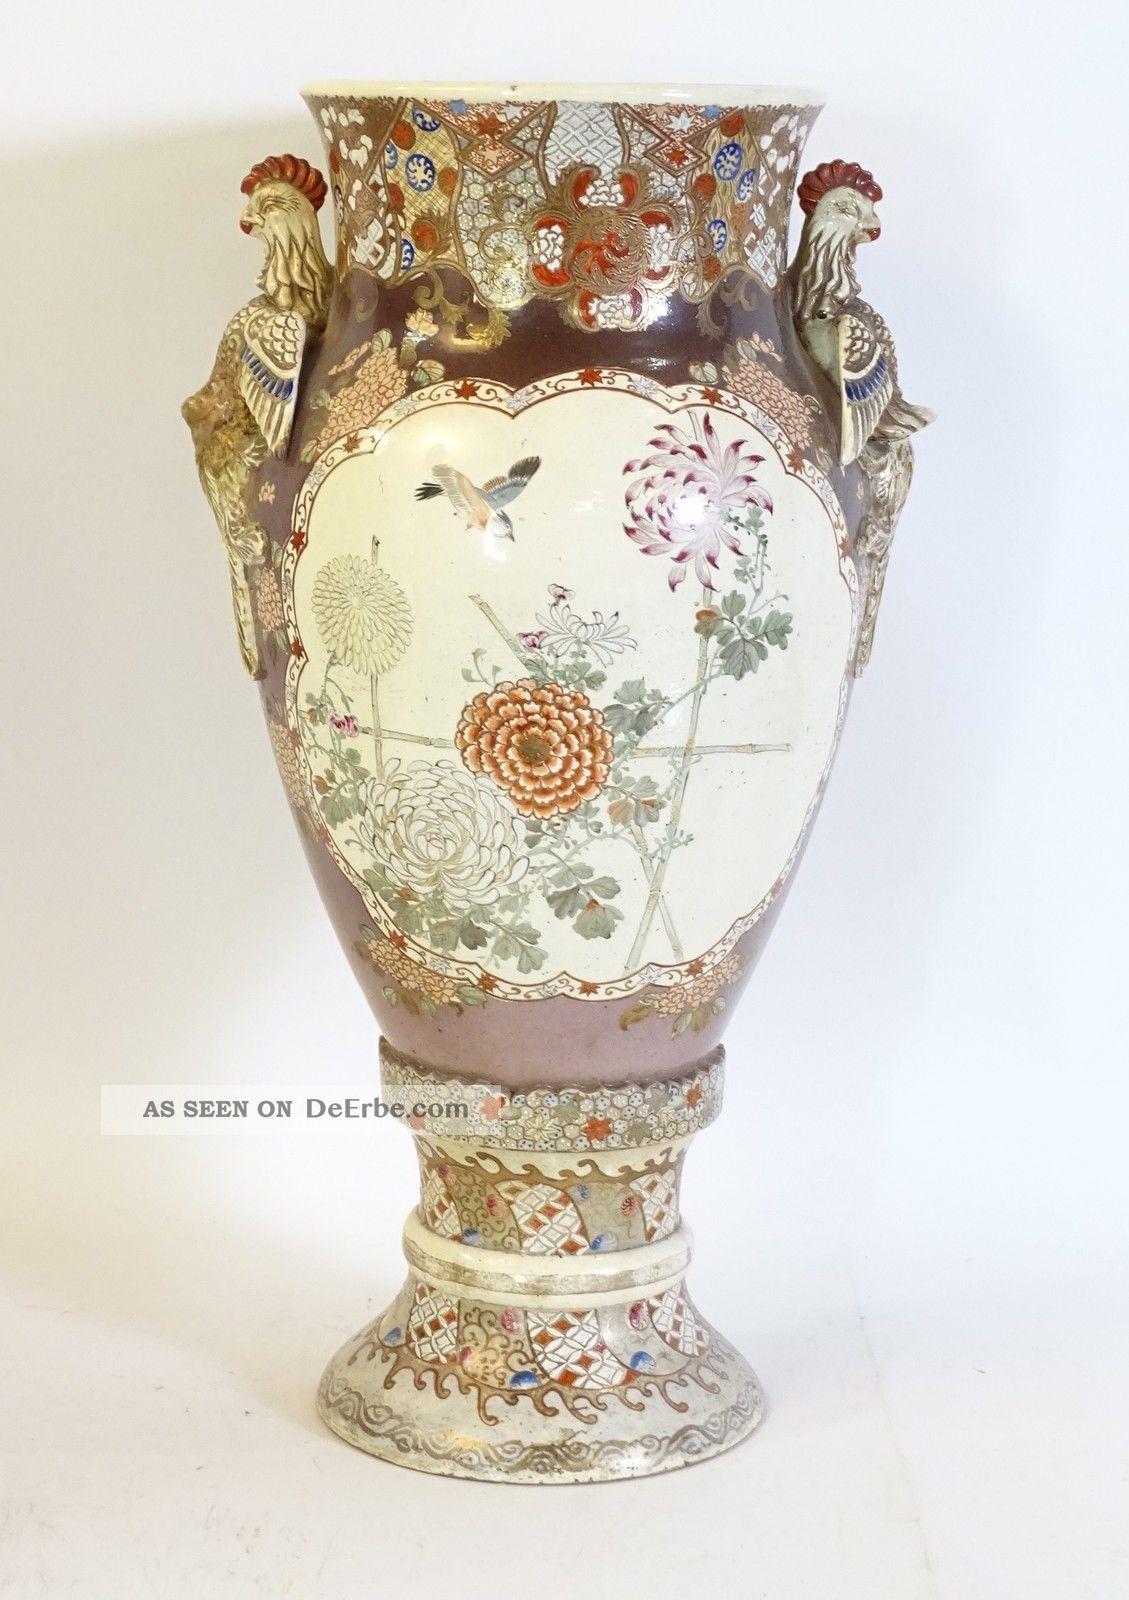 Top Rarität Riesige Japan Japanische Vase Keramik Satsuma / Meji 1868 - 1912 Asiatika: Japan Bild